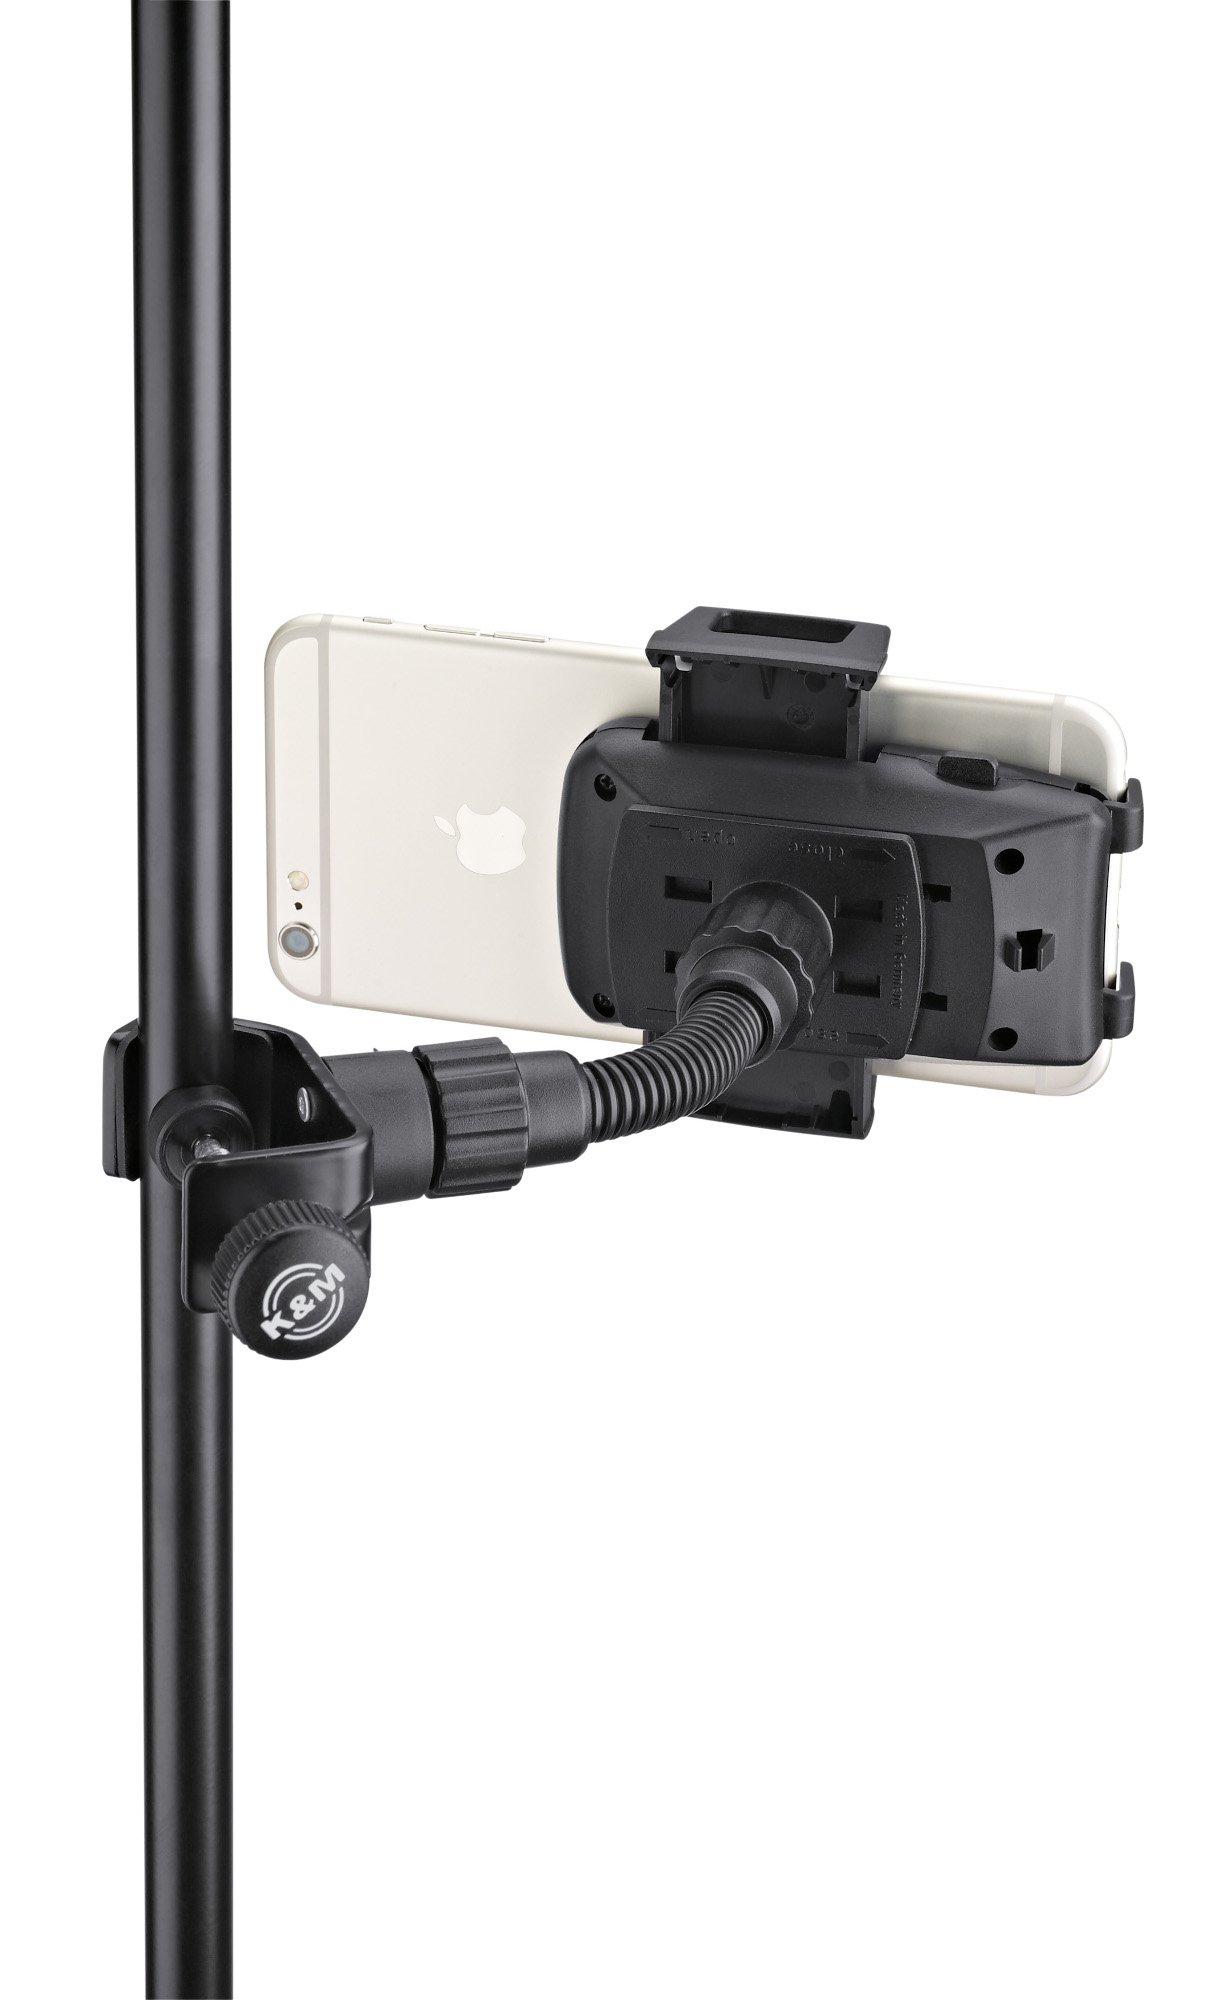 Universal Smartphone Holder